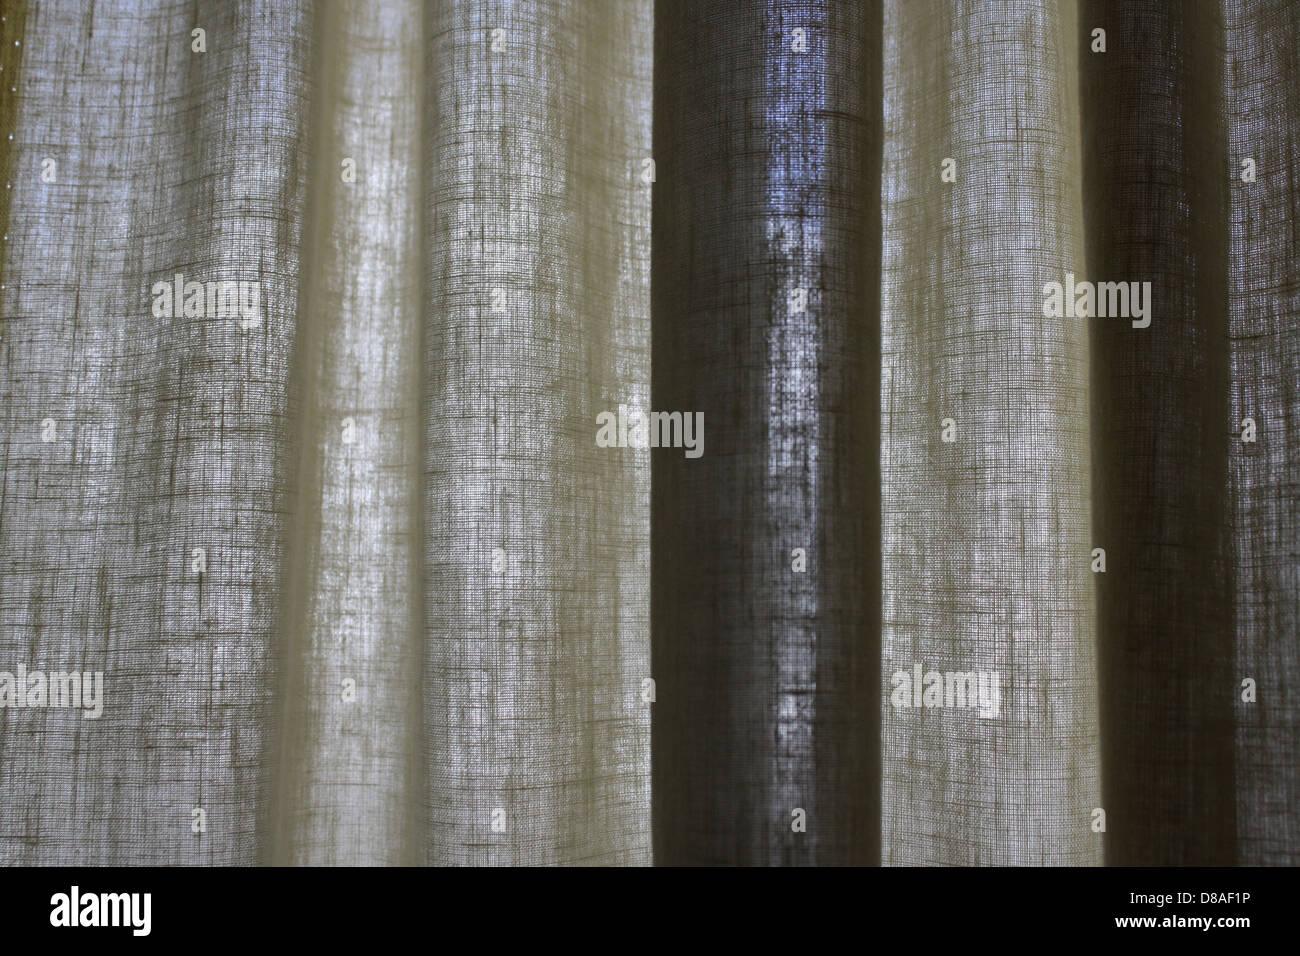 Curtains texture - Stock Photo Light Through Curtains Texture